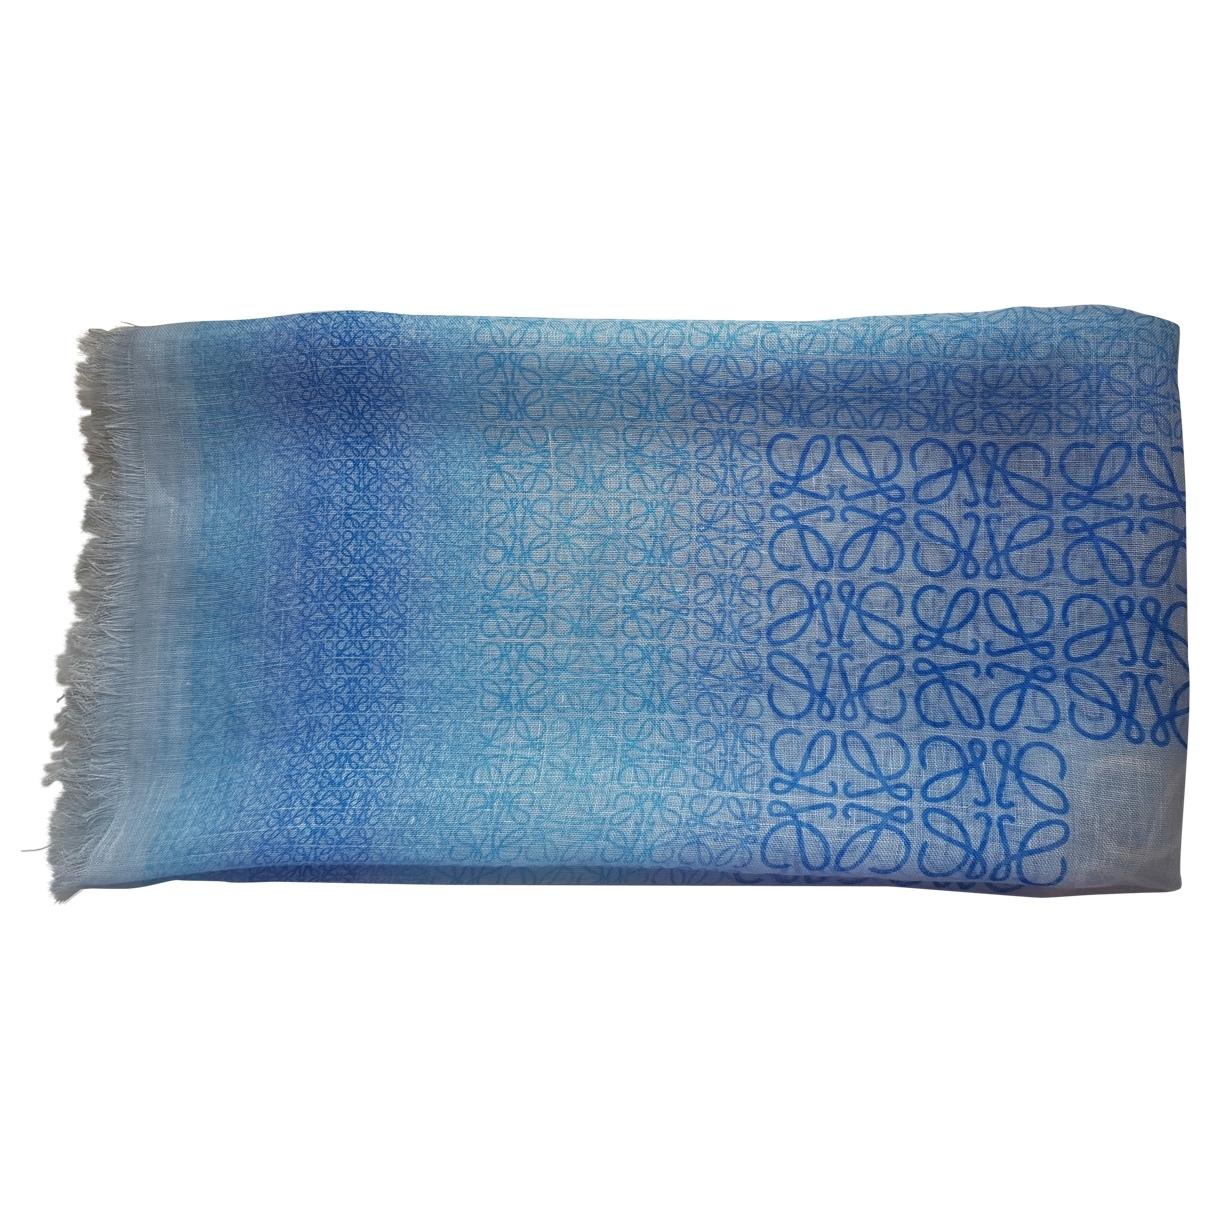 Loewe - Foulard   pour femme en lin - bleu